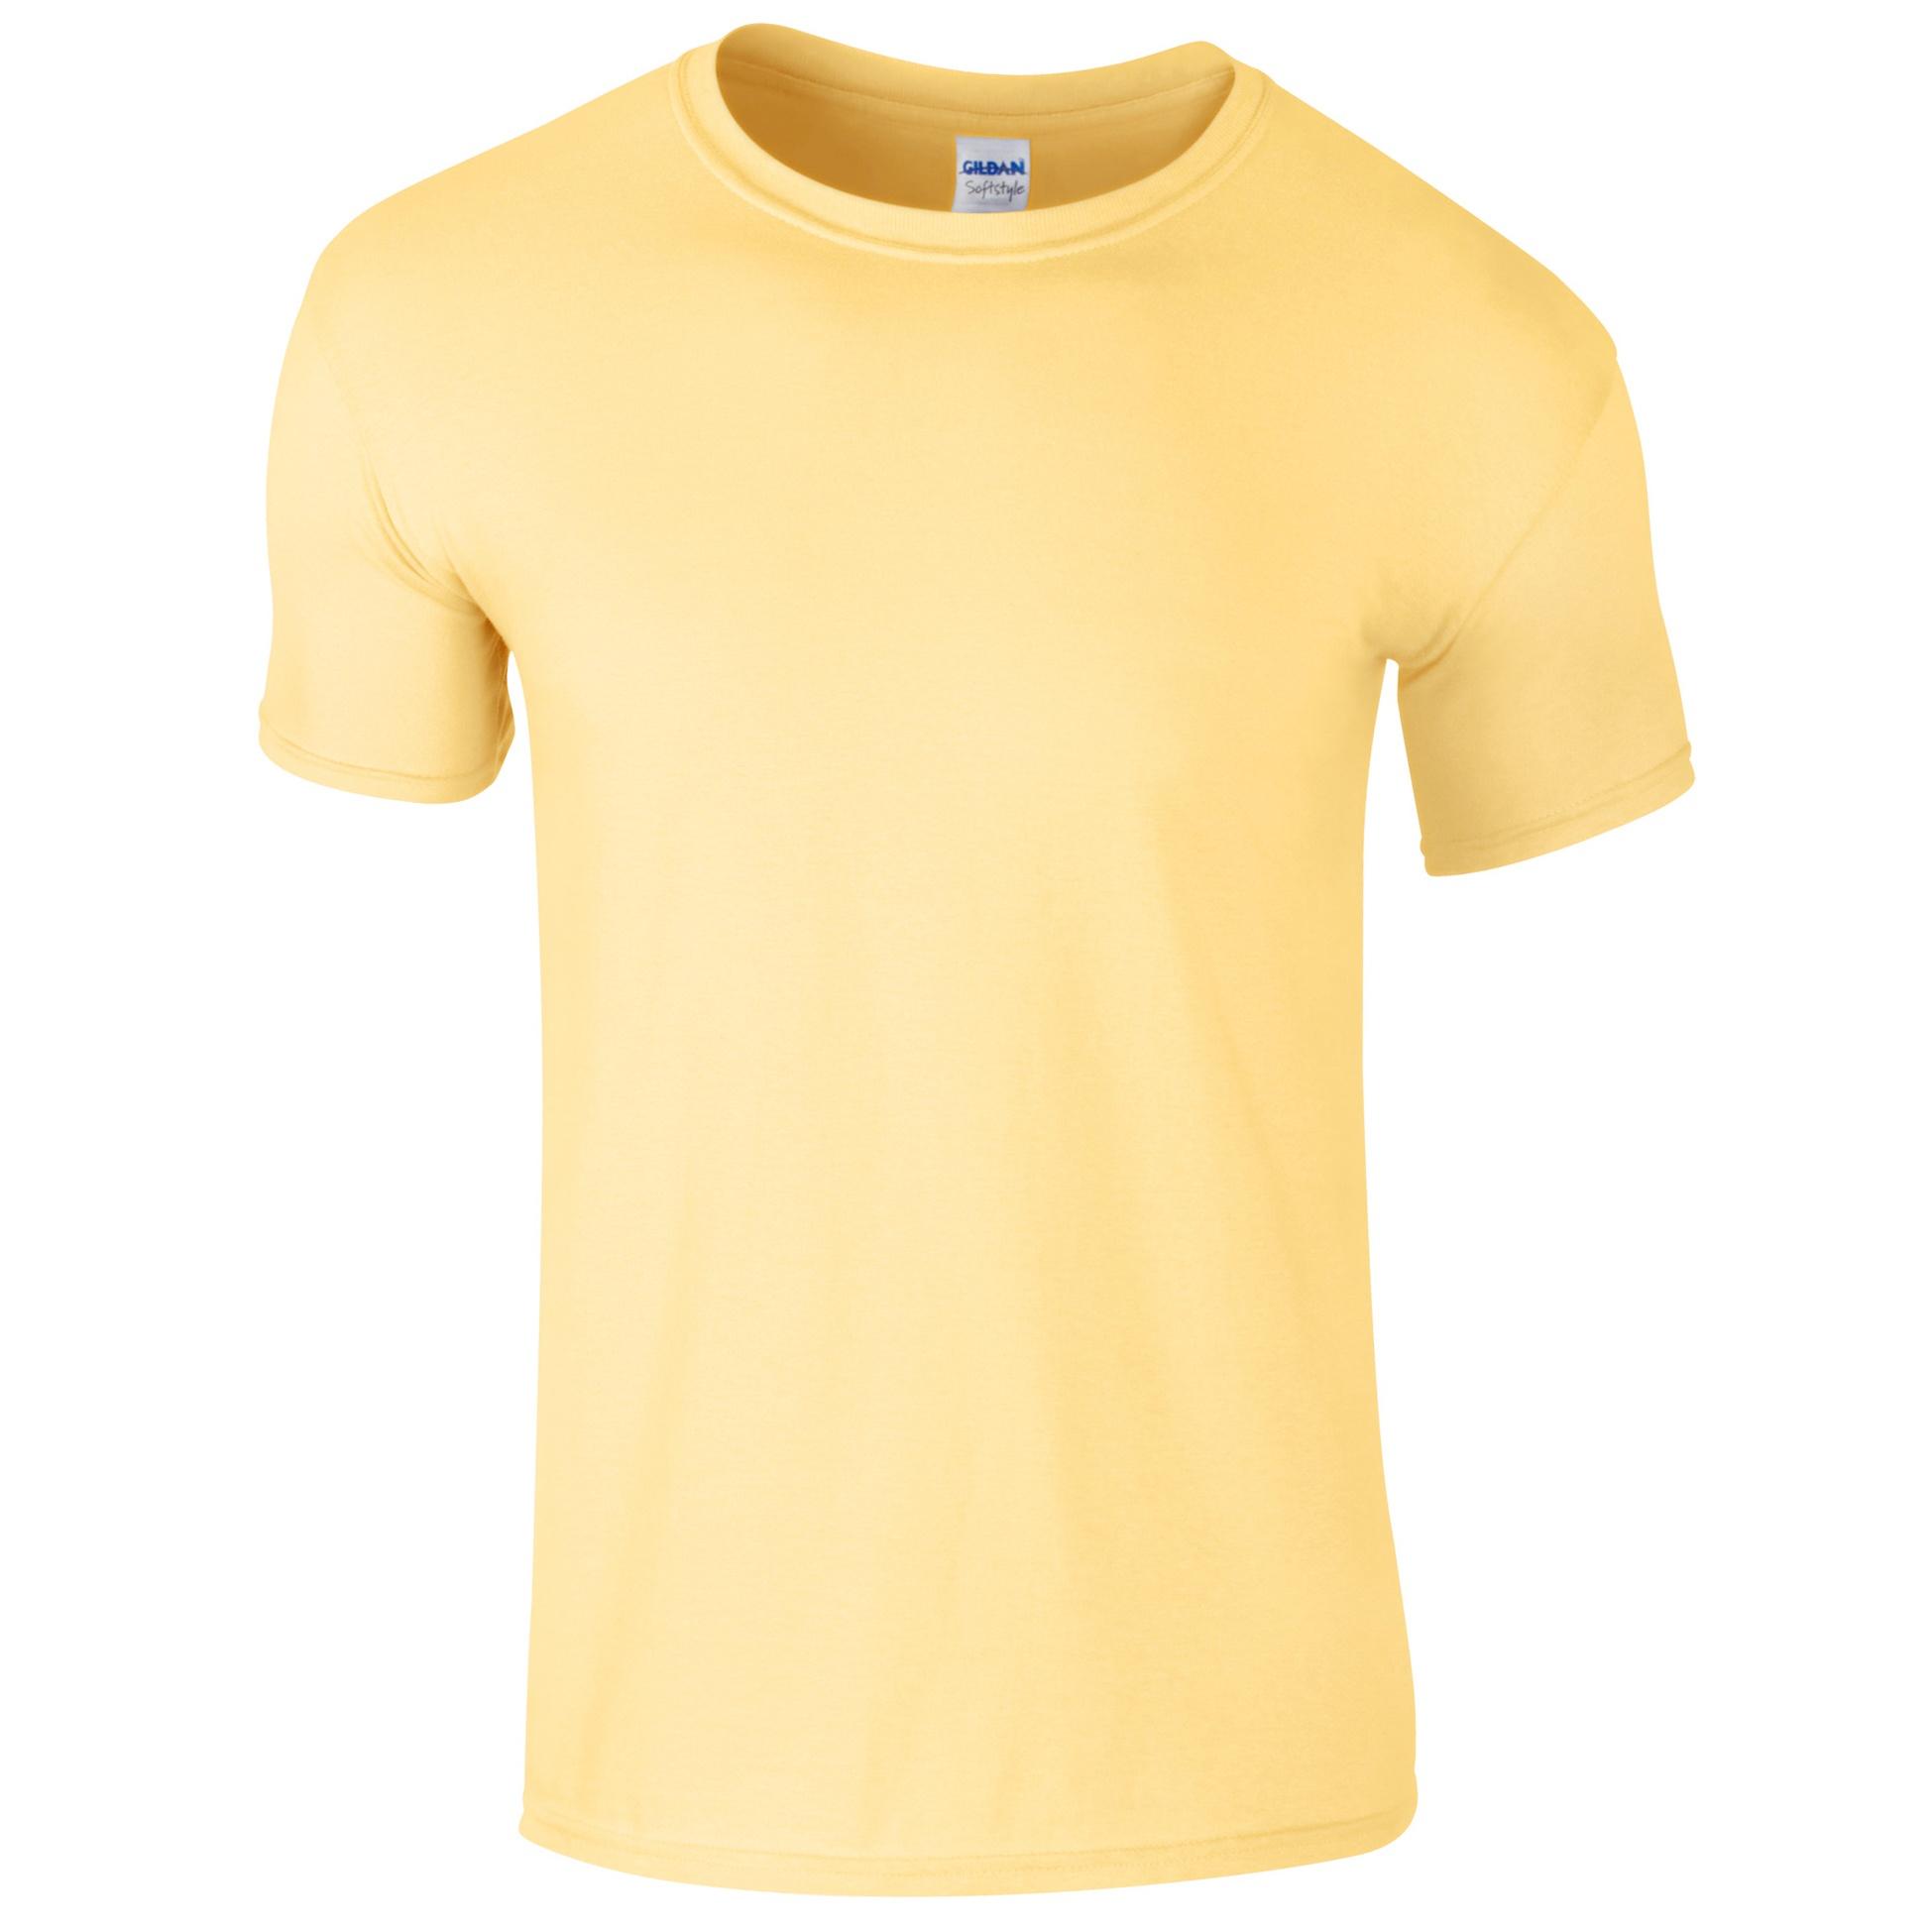 Gildan mens short sleeve soft style t shirt bc484 ebay for Gildan t shirt styles